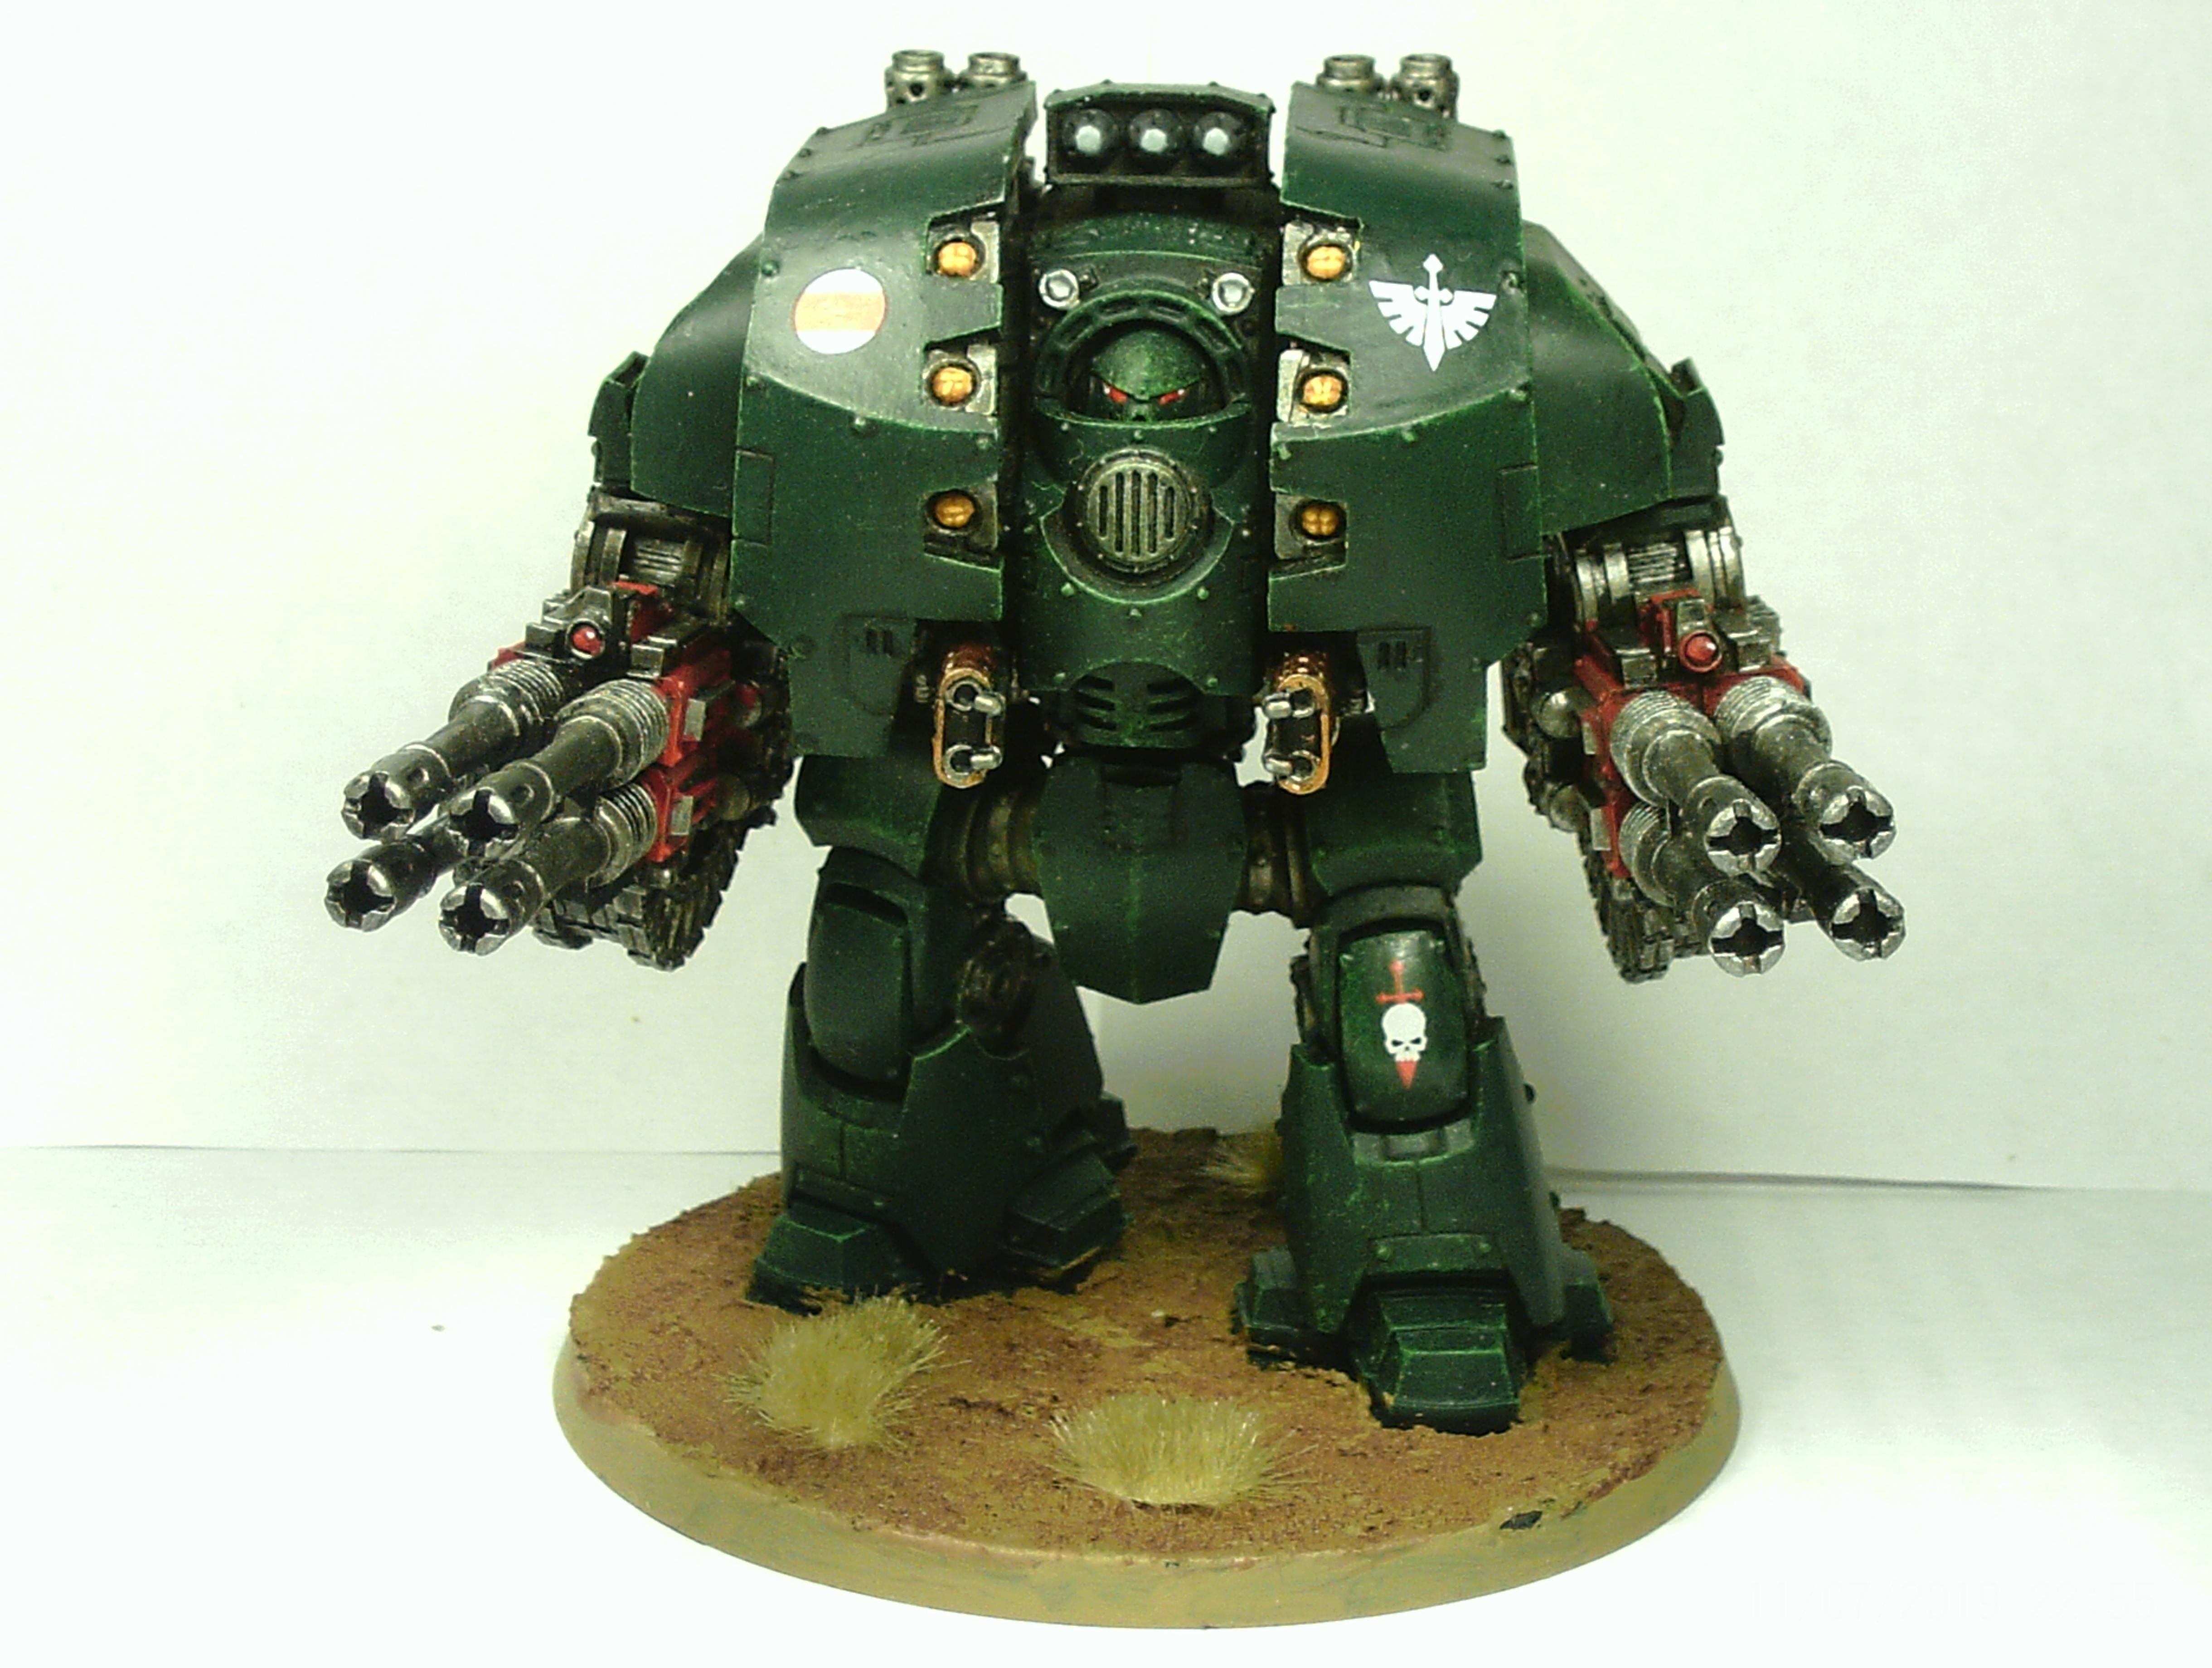 30k, Angel, Dark, Dreadnought, Leviathan, Relic, Space, Space Marines, Walker, Warhammer 40,000